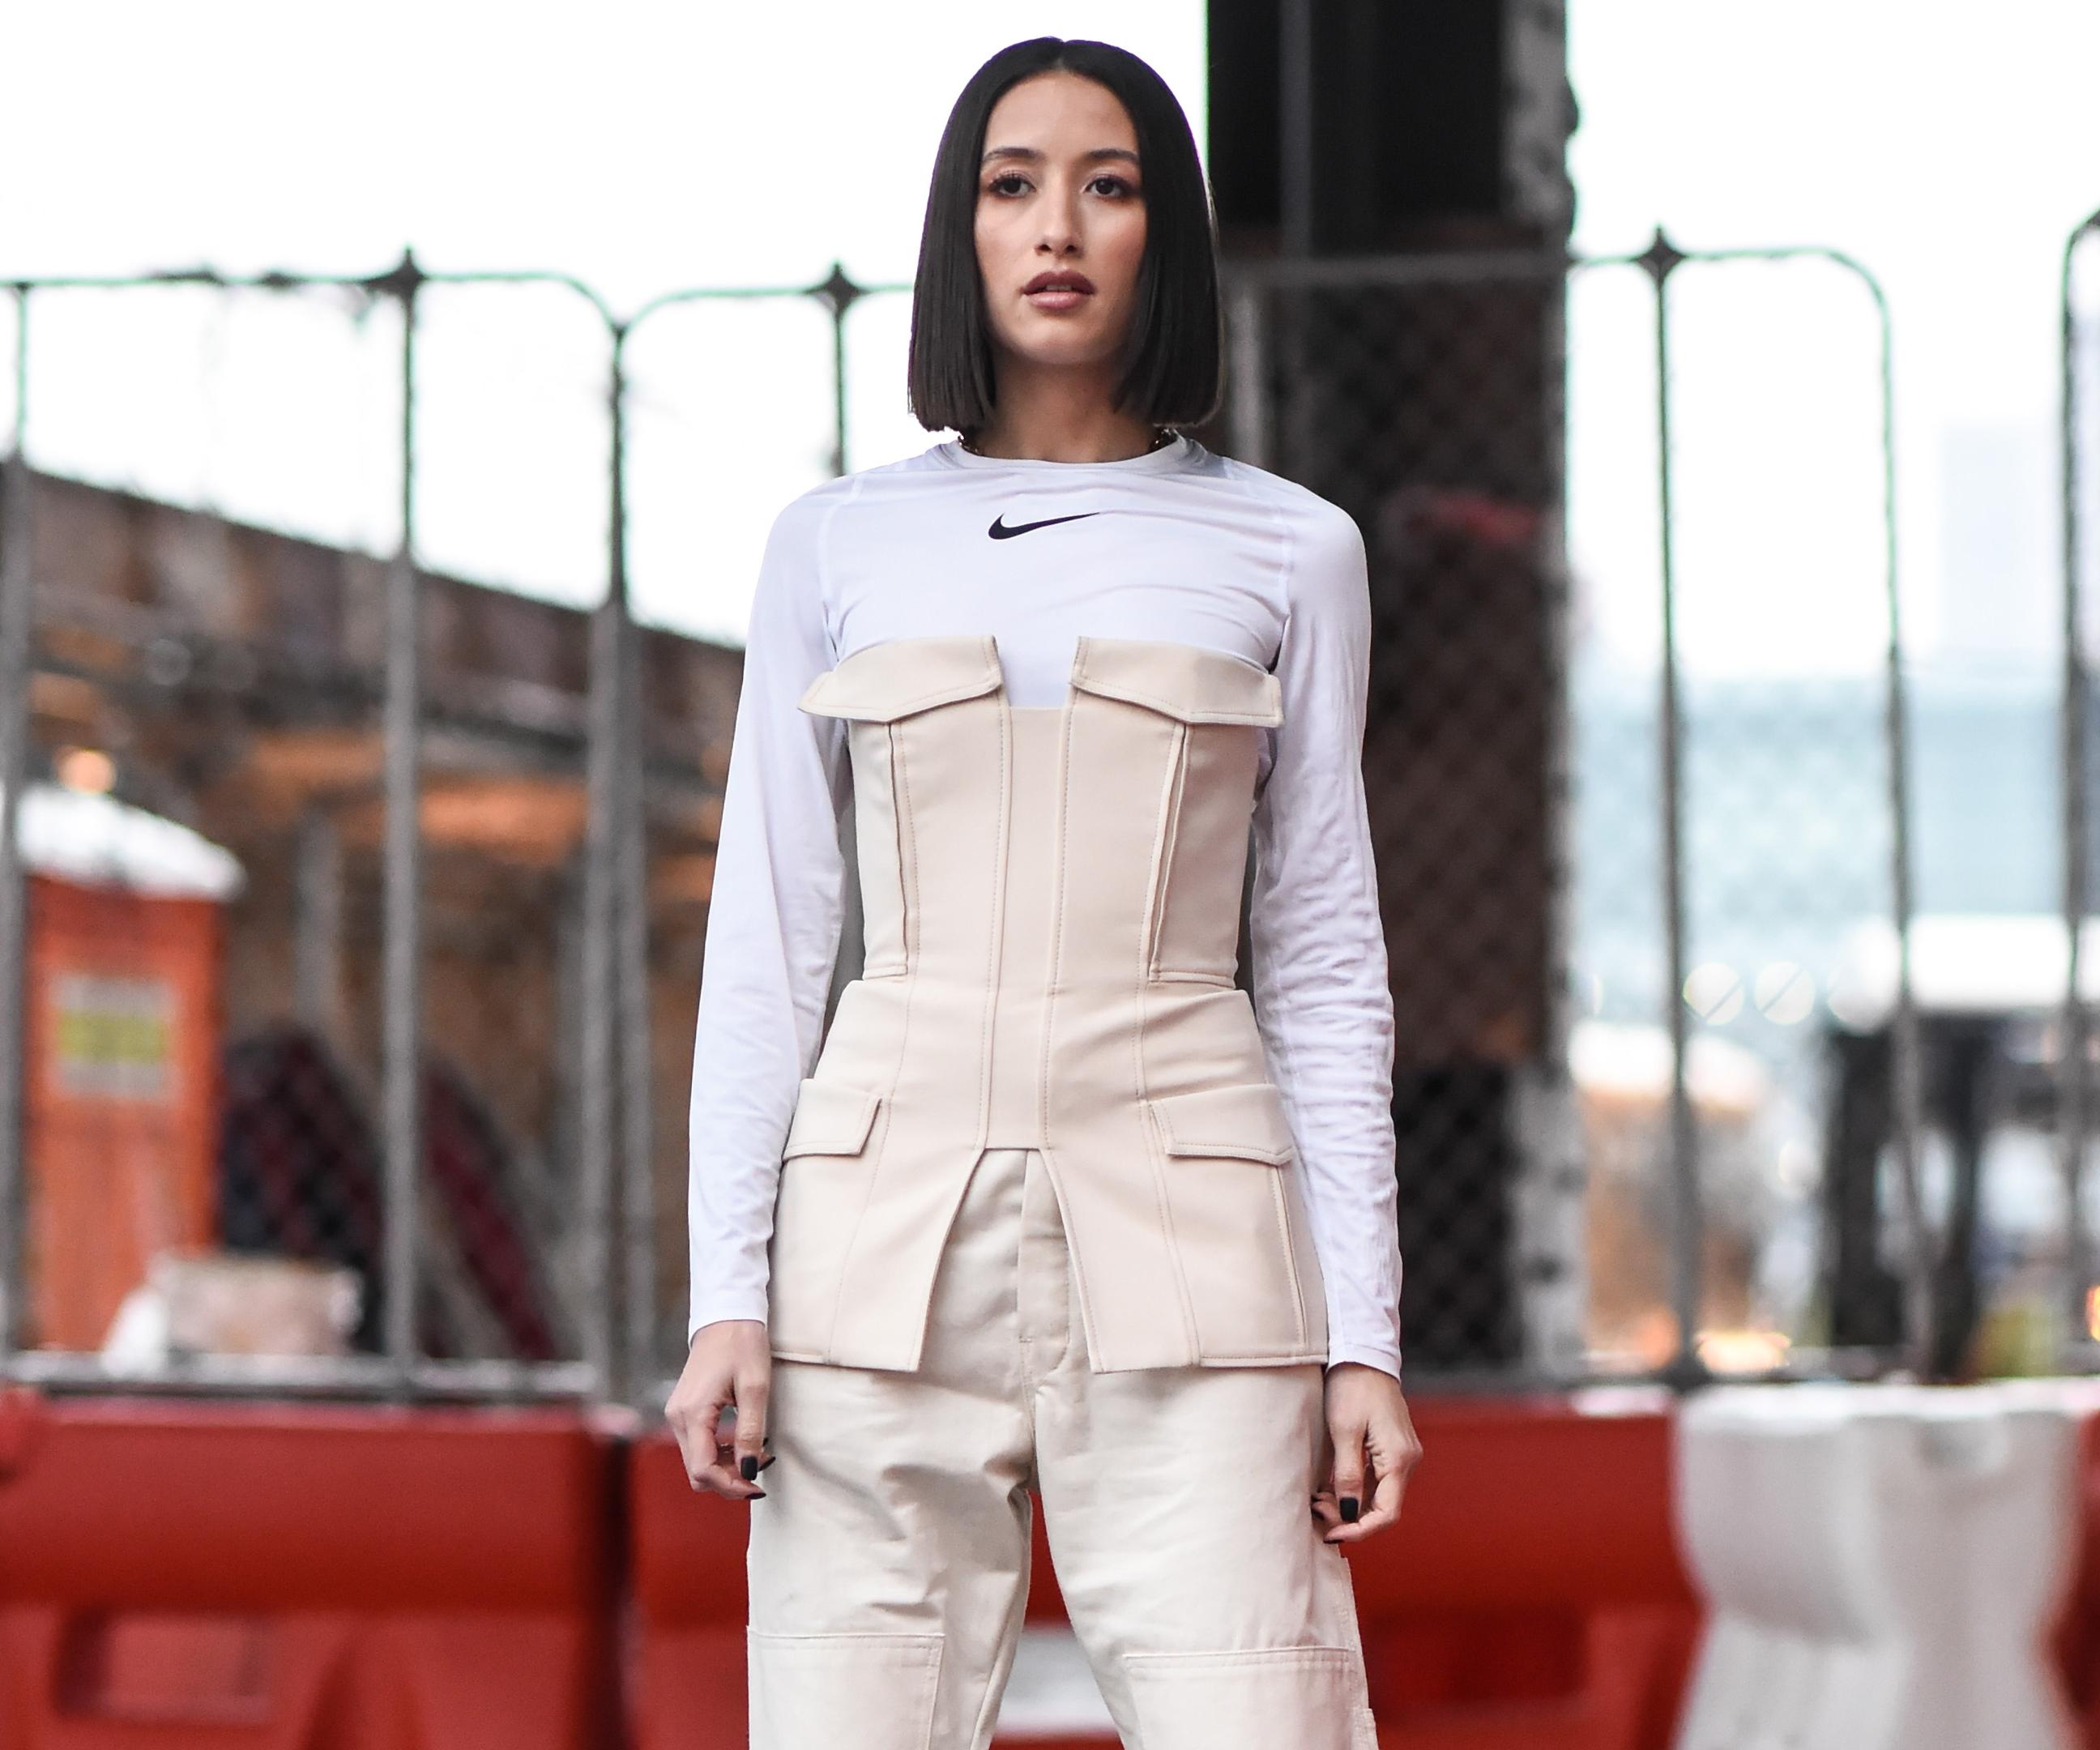 Pin by Cindy Lee on My Virtual Closet | Nmd adidas women